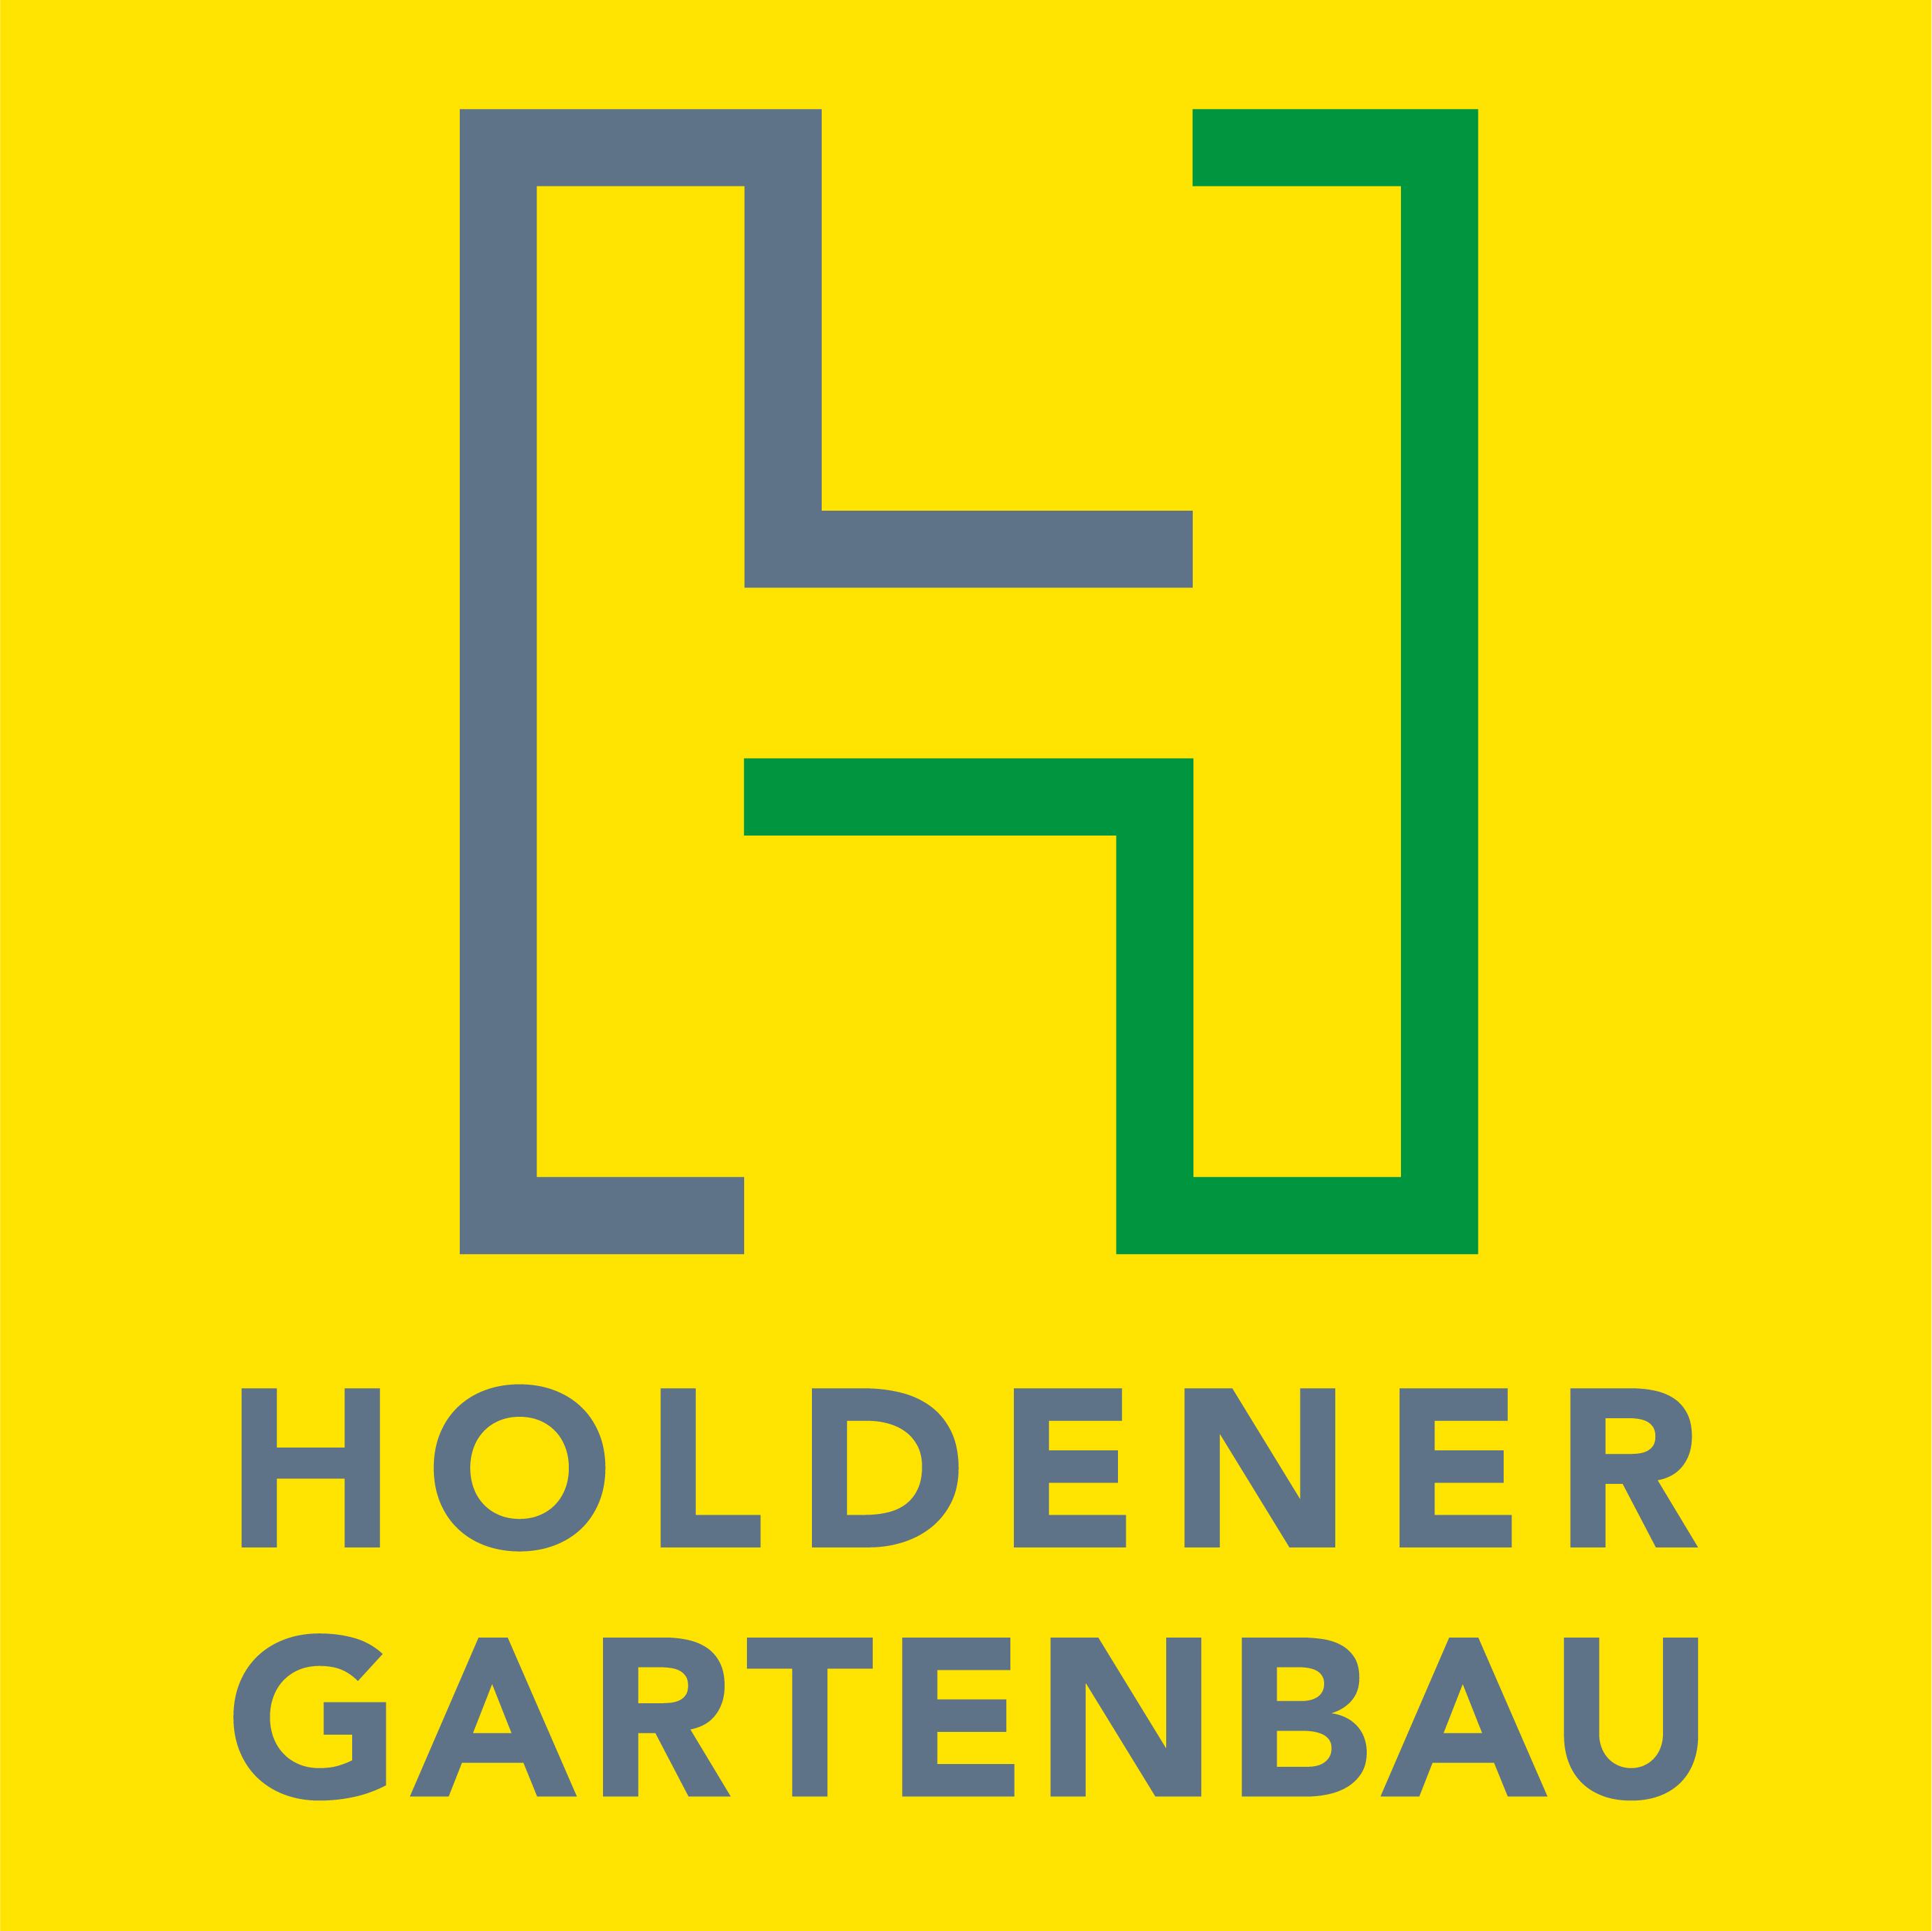 Holdener Gartenbau